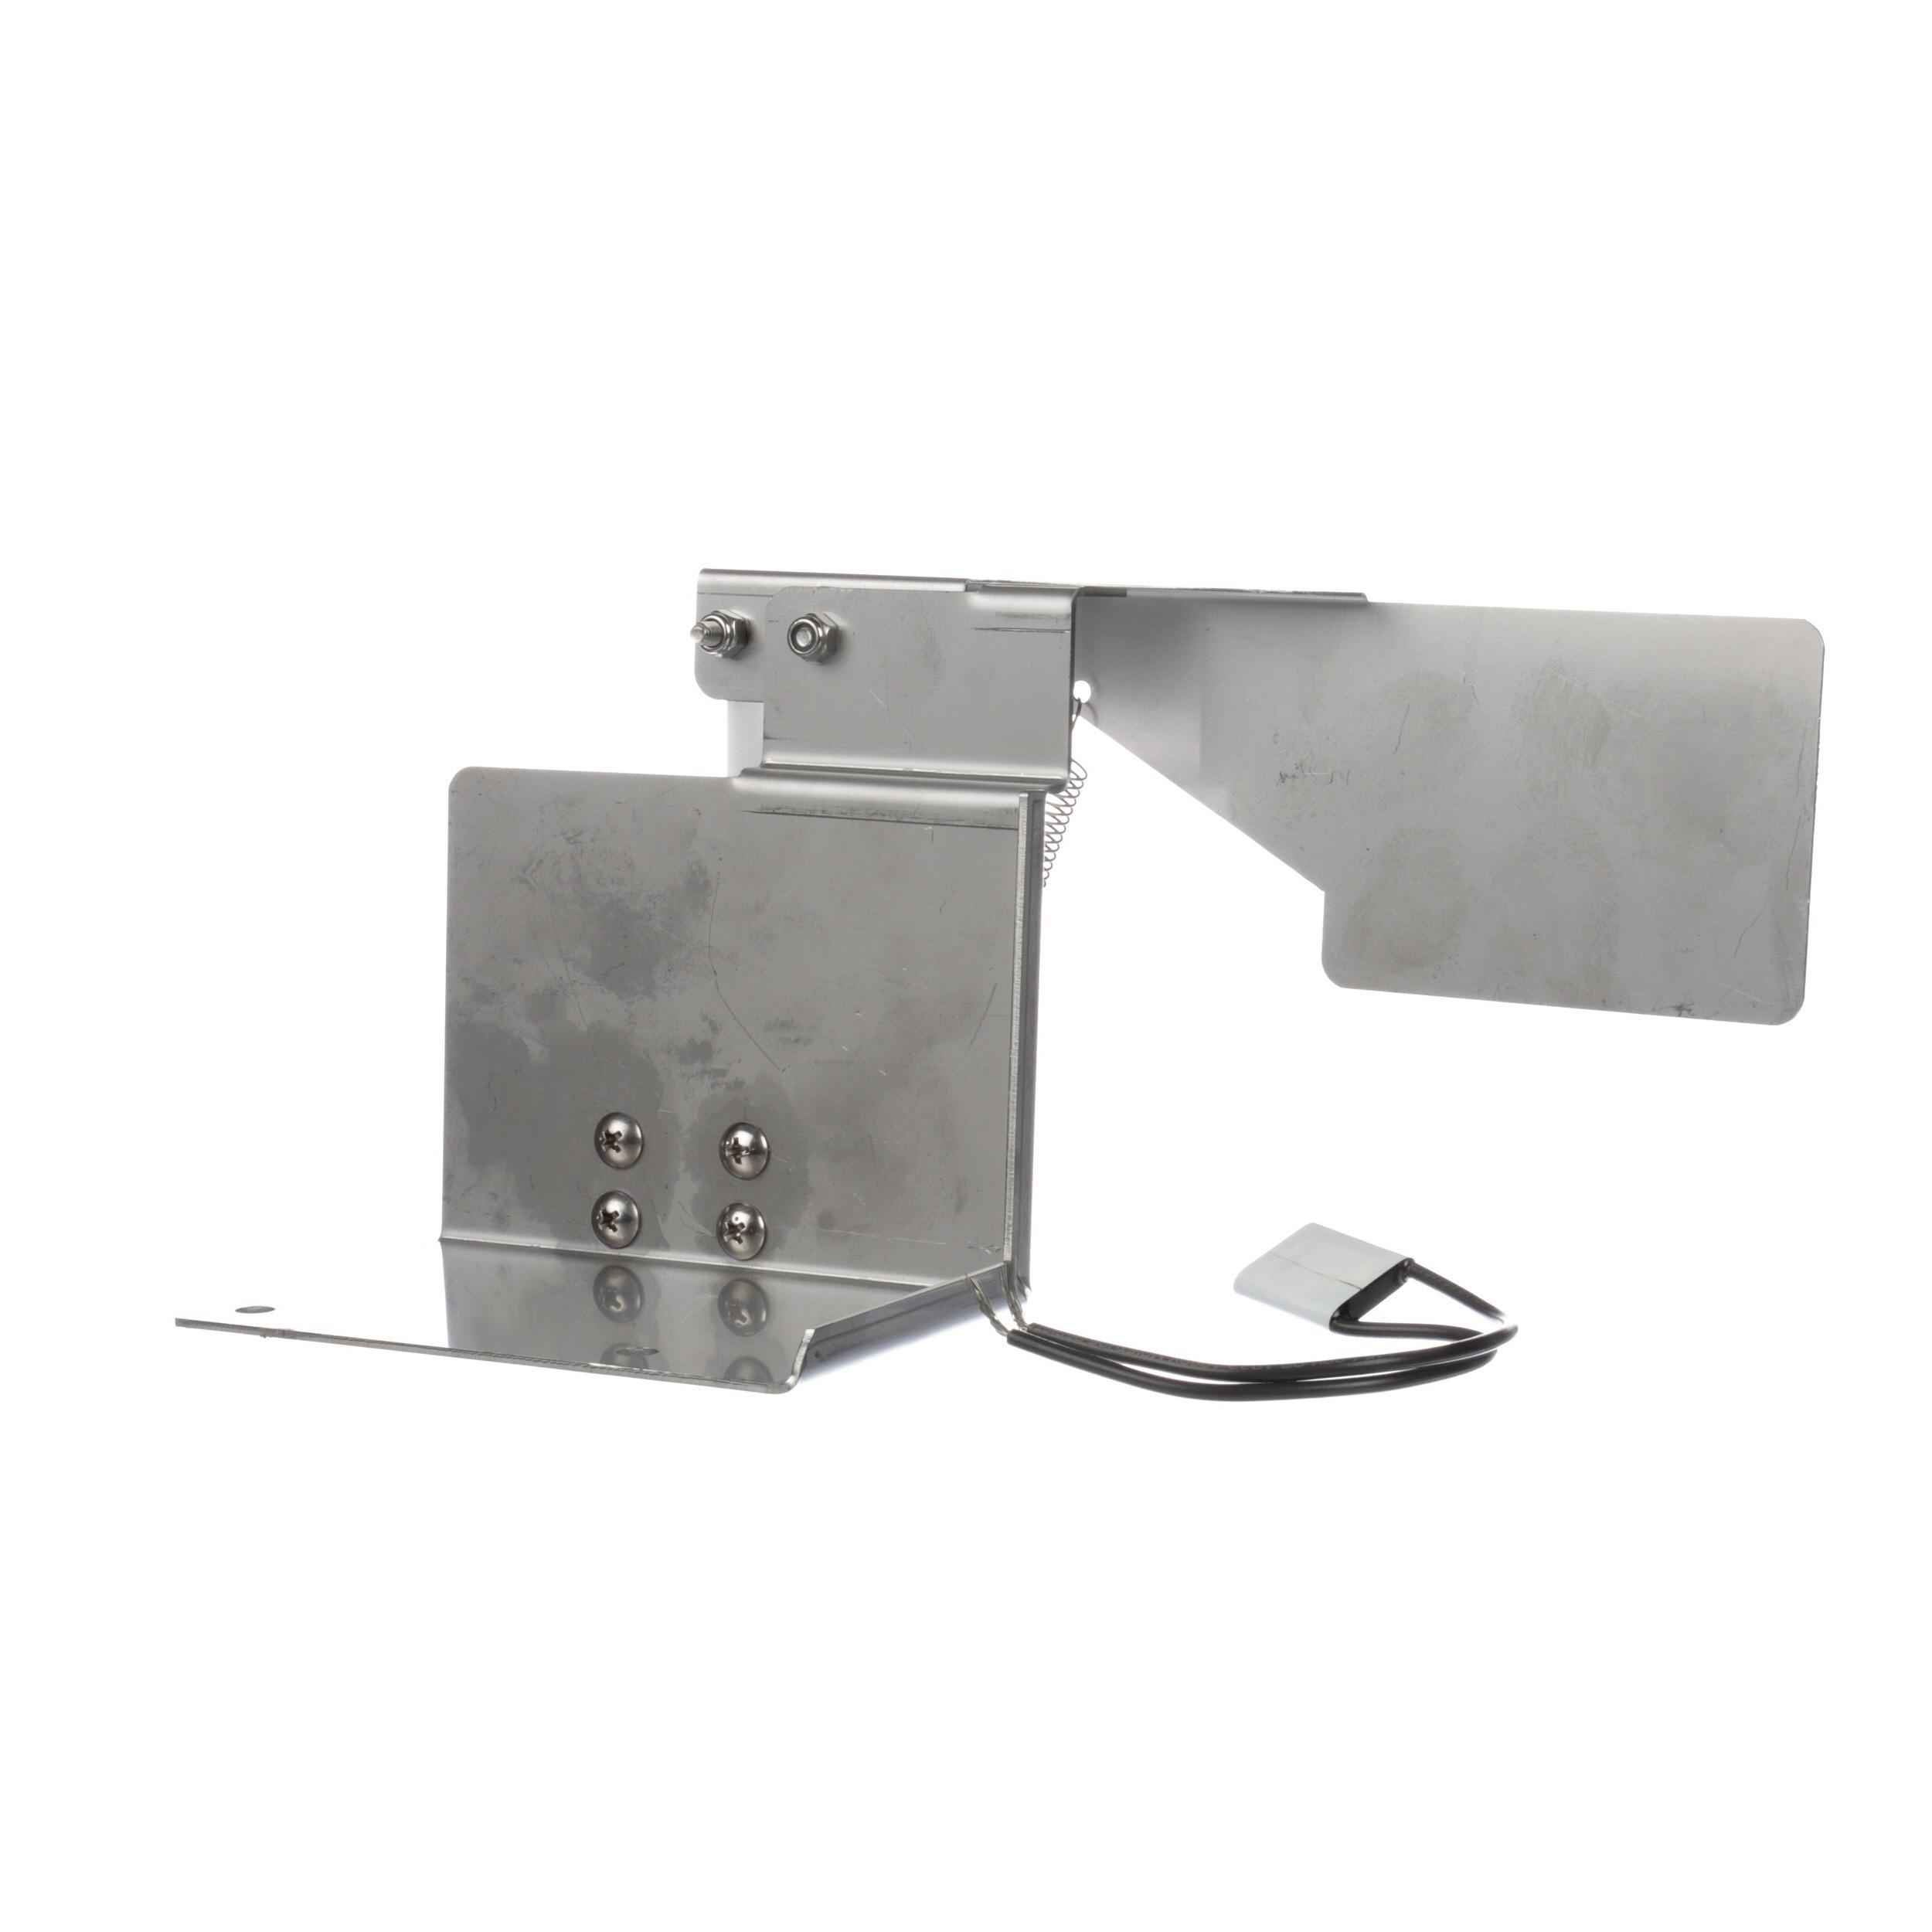 hoshizaki shutter assy needs wiring dc part 2a6131a01. Black Bedroom Furniture Sets. Home Design Ideas